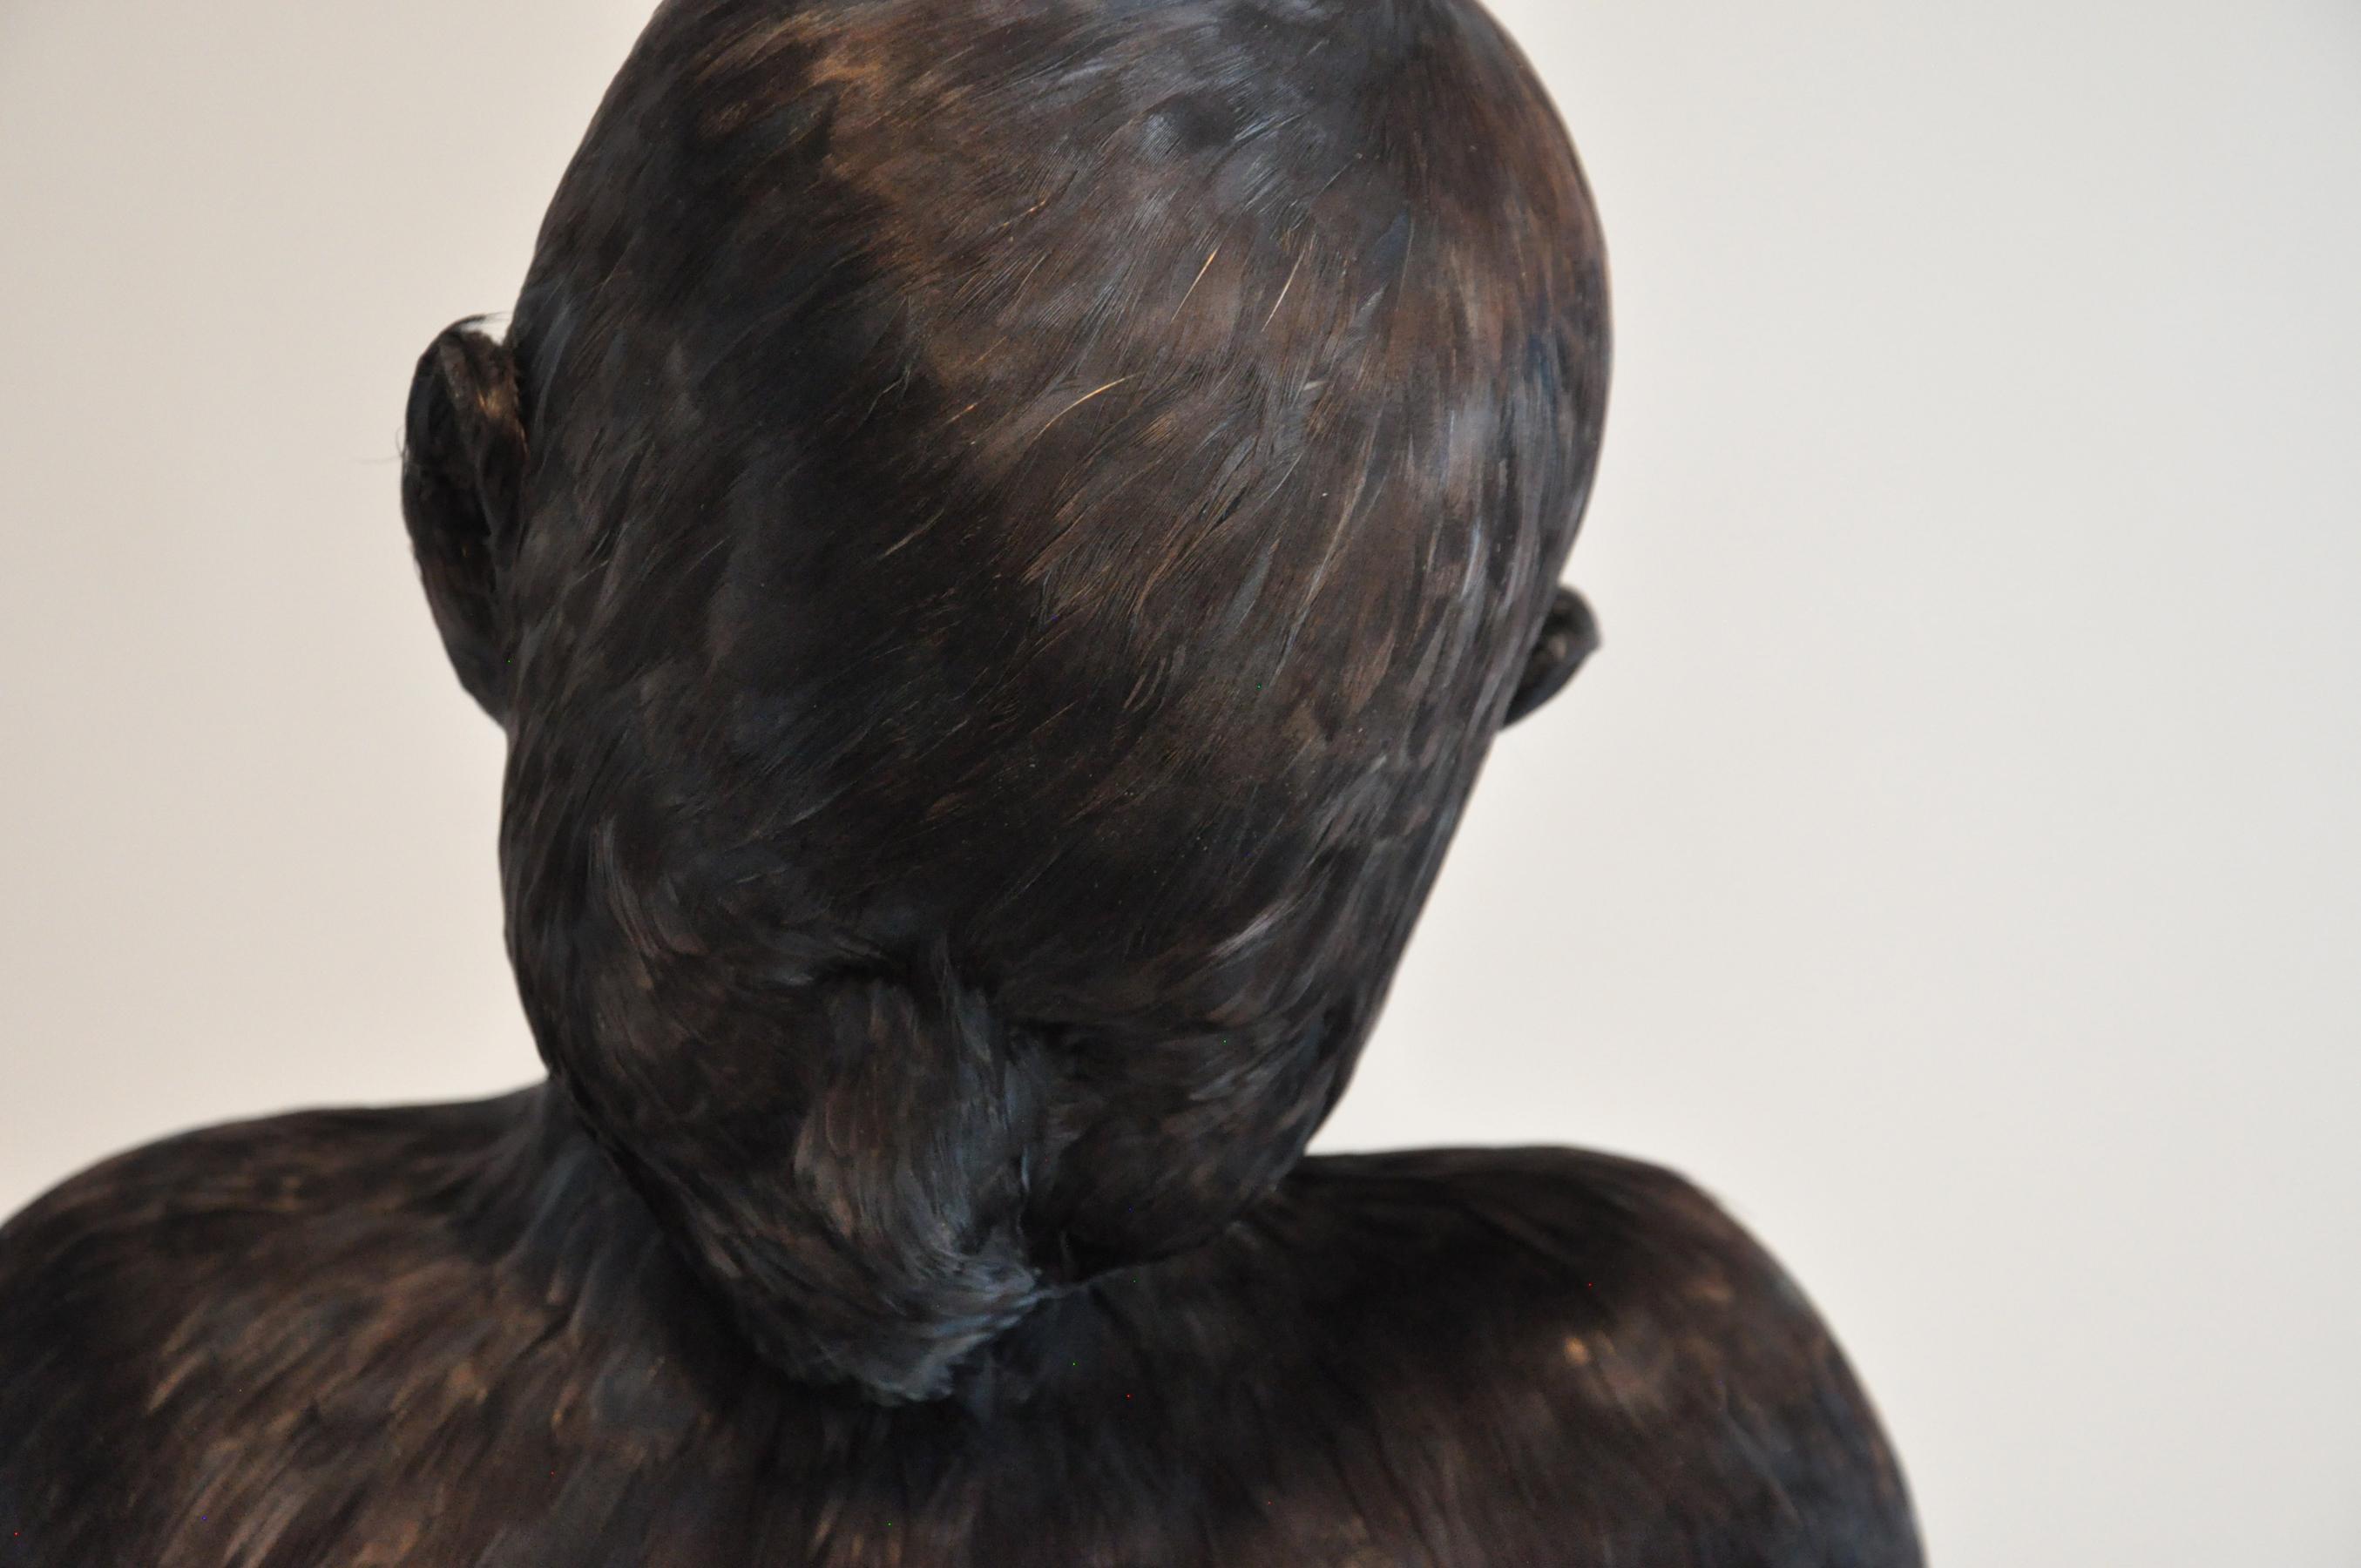 Child Head 1